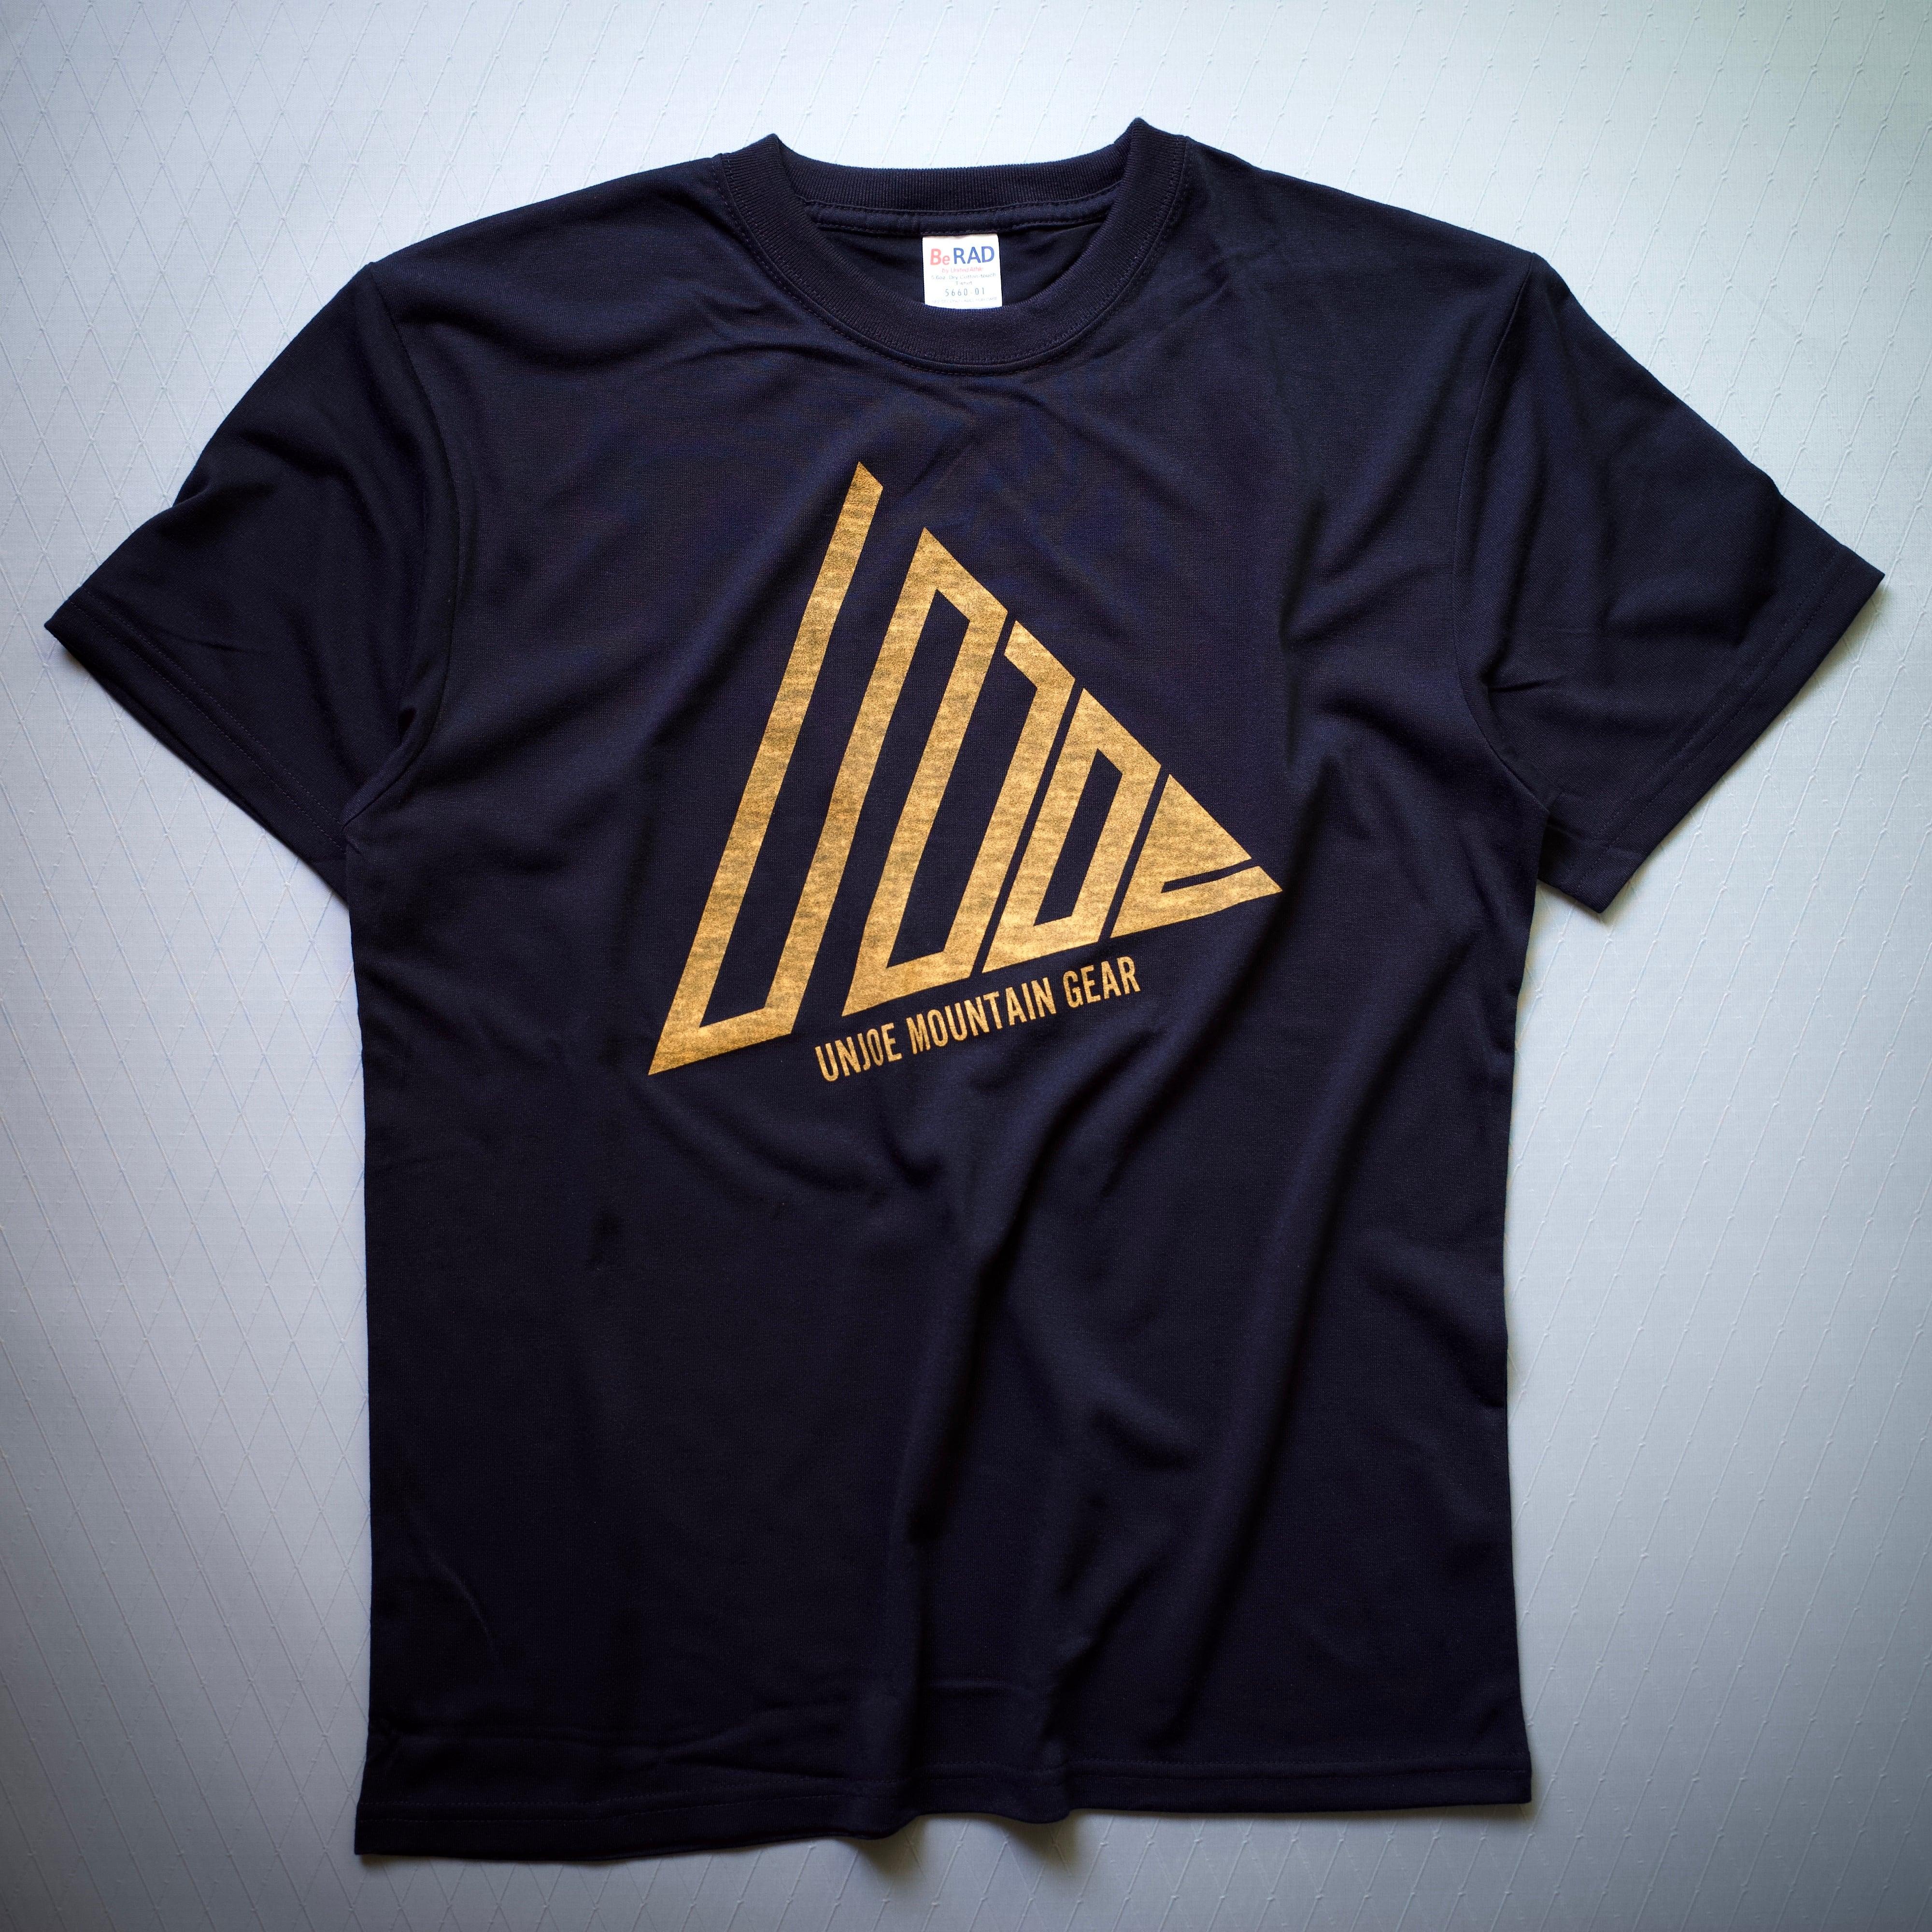 UNJOE T-shirt (Navy)